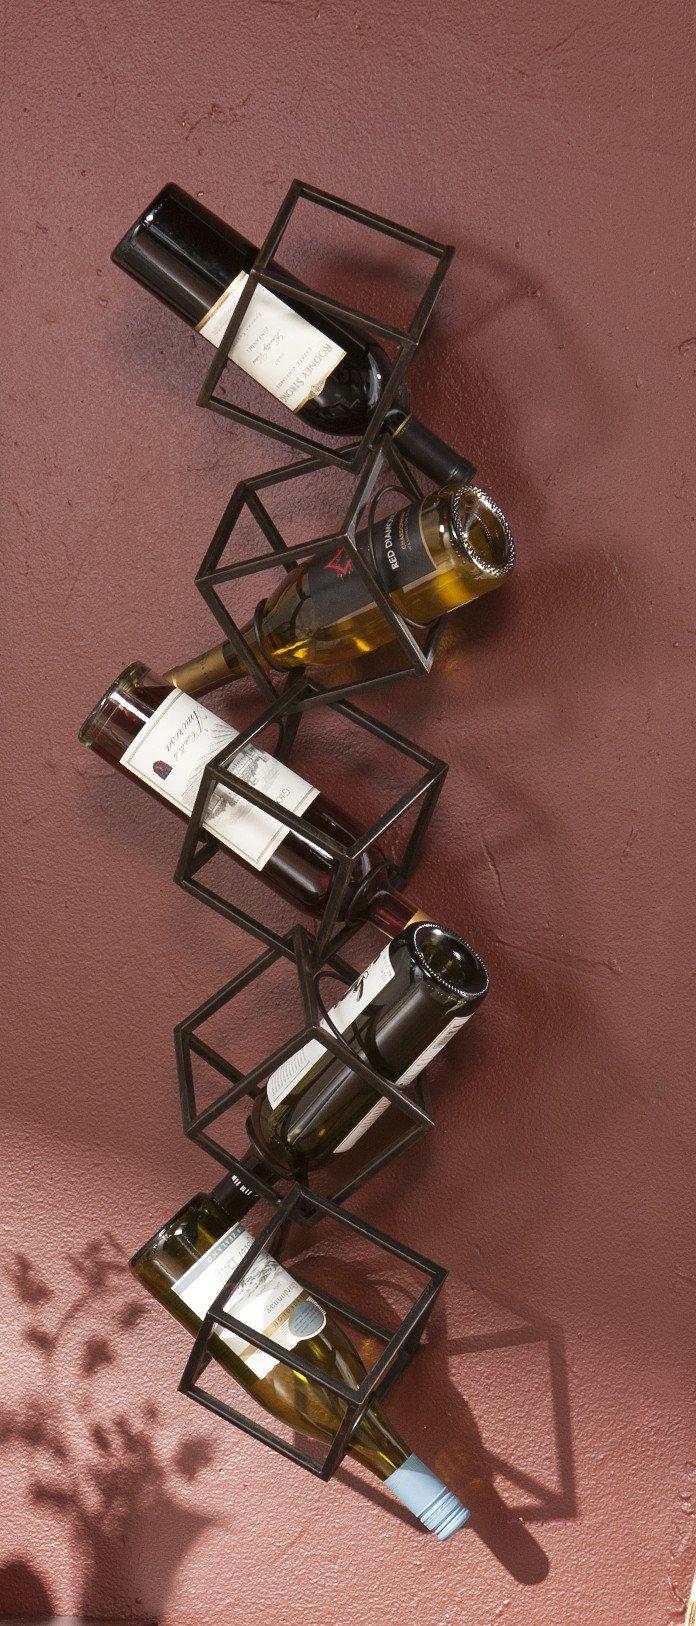 Carini 5 Bottle Wall Mounted Wine Rack